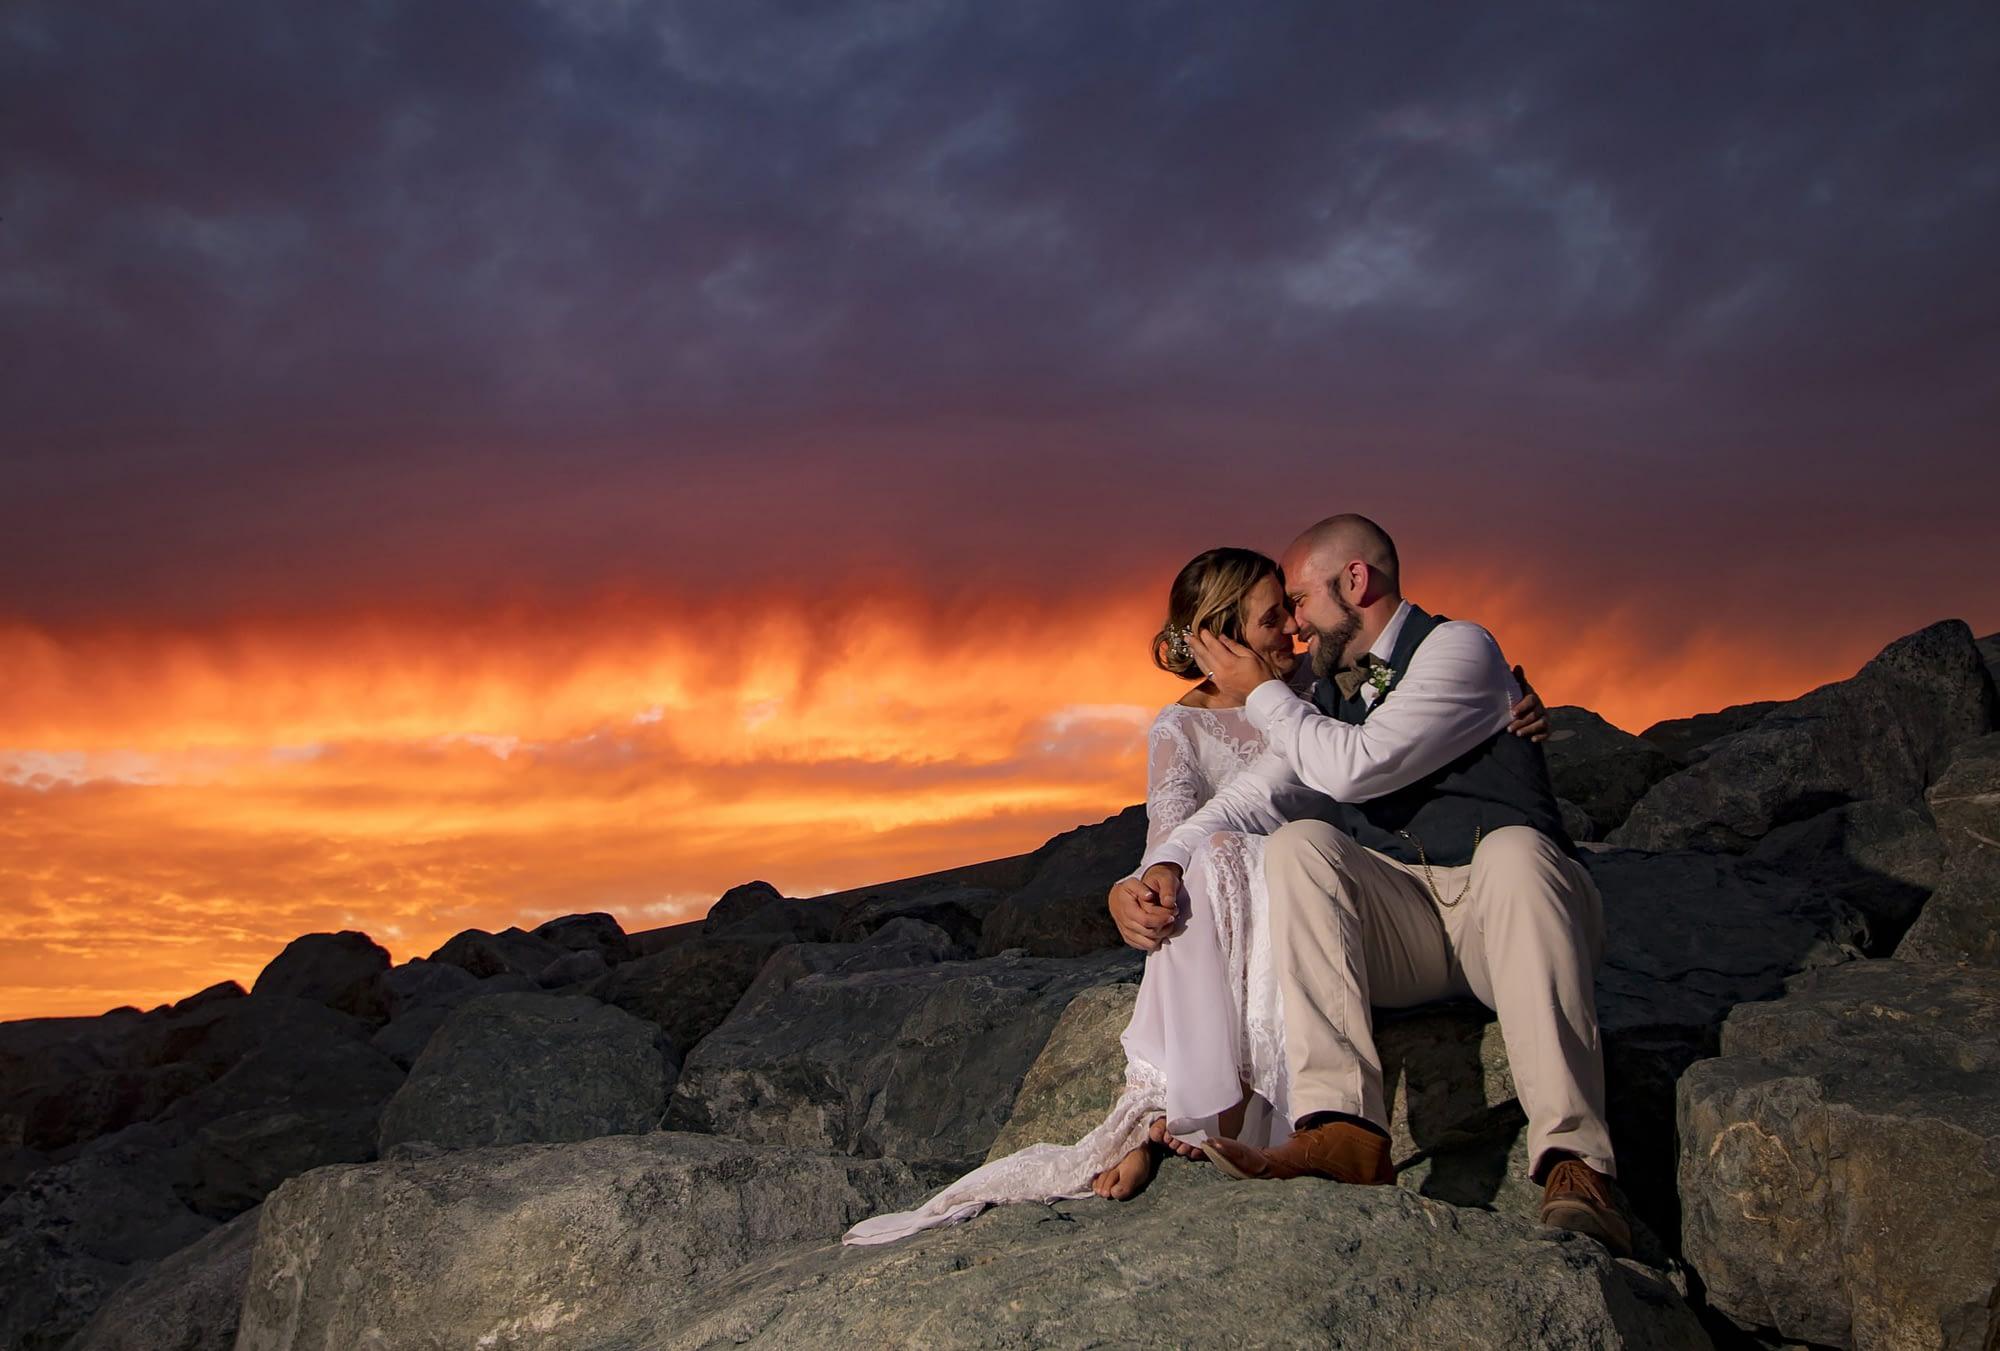 couple sitting on rocks kissing with orange sky